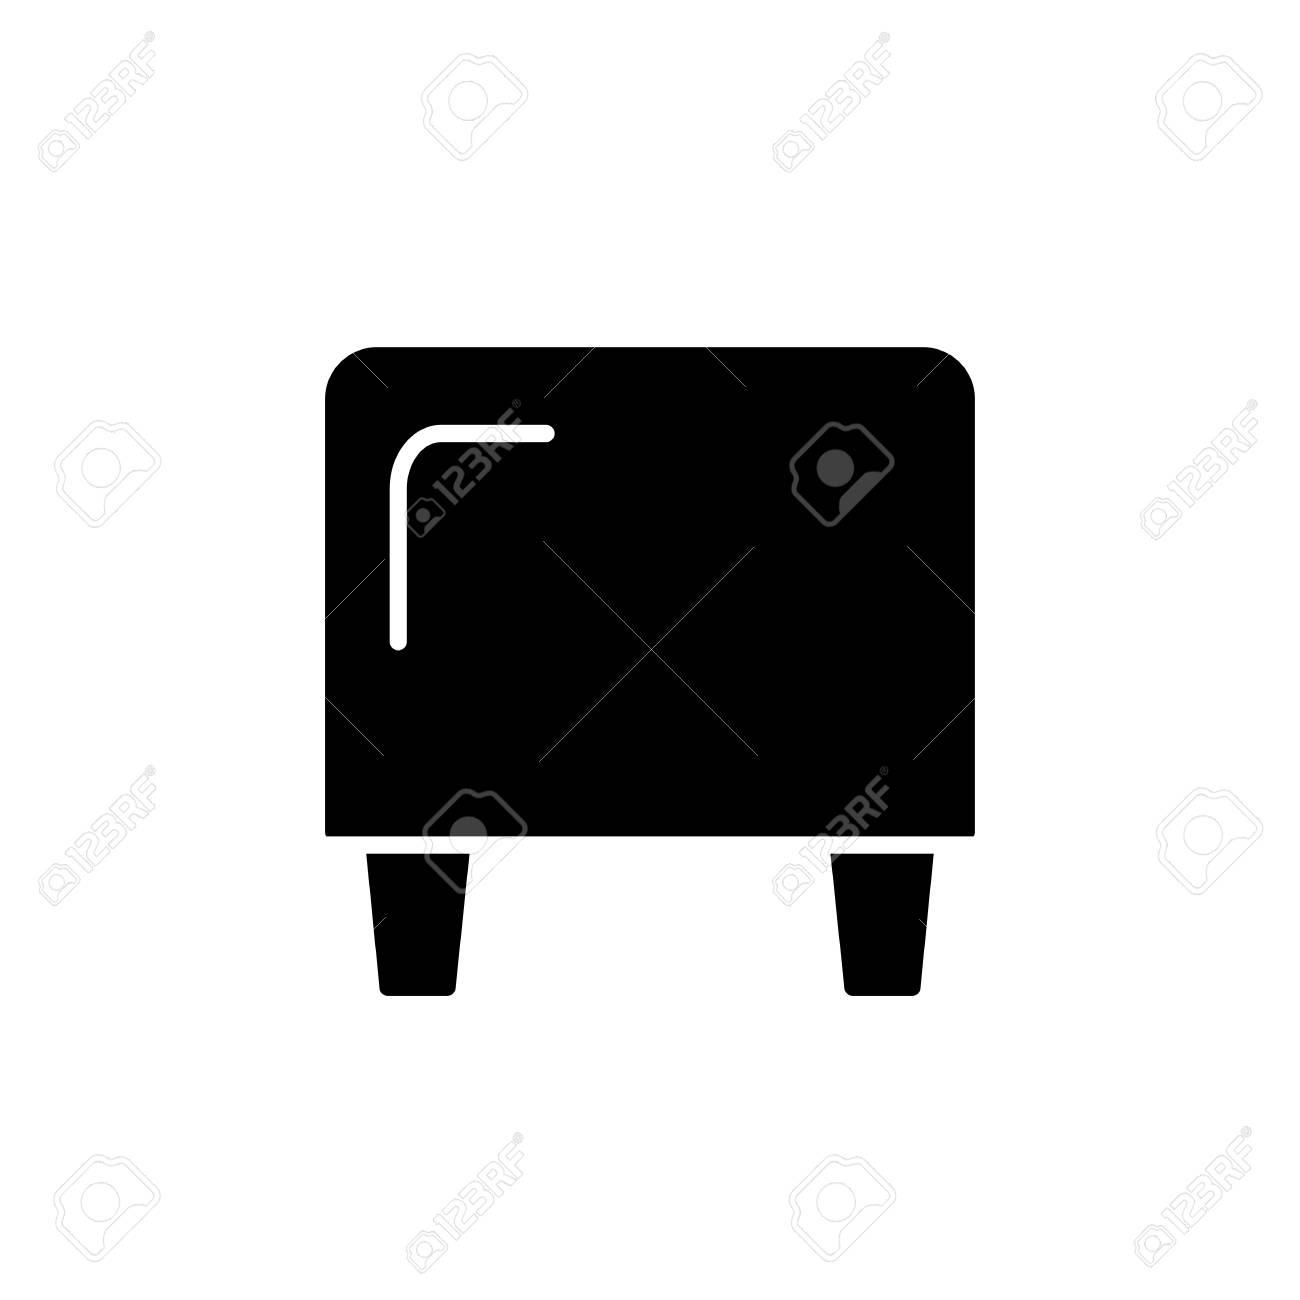 Groovy Black White Vector Illustration Of Cube Leather Ottoman Pouf Evergreenethics Interior Chair Design Evergreenethicsorg